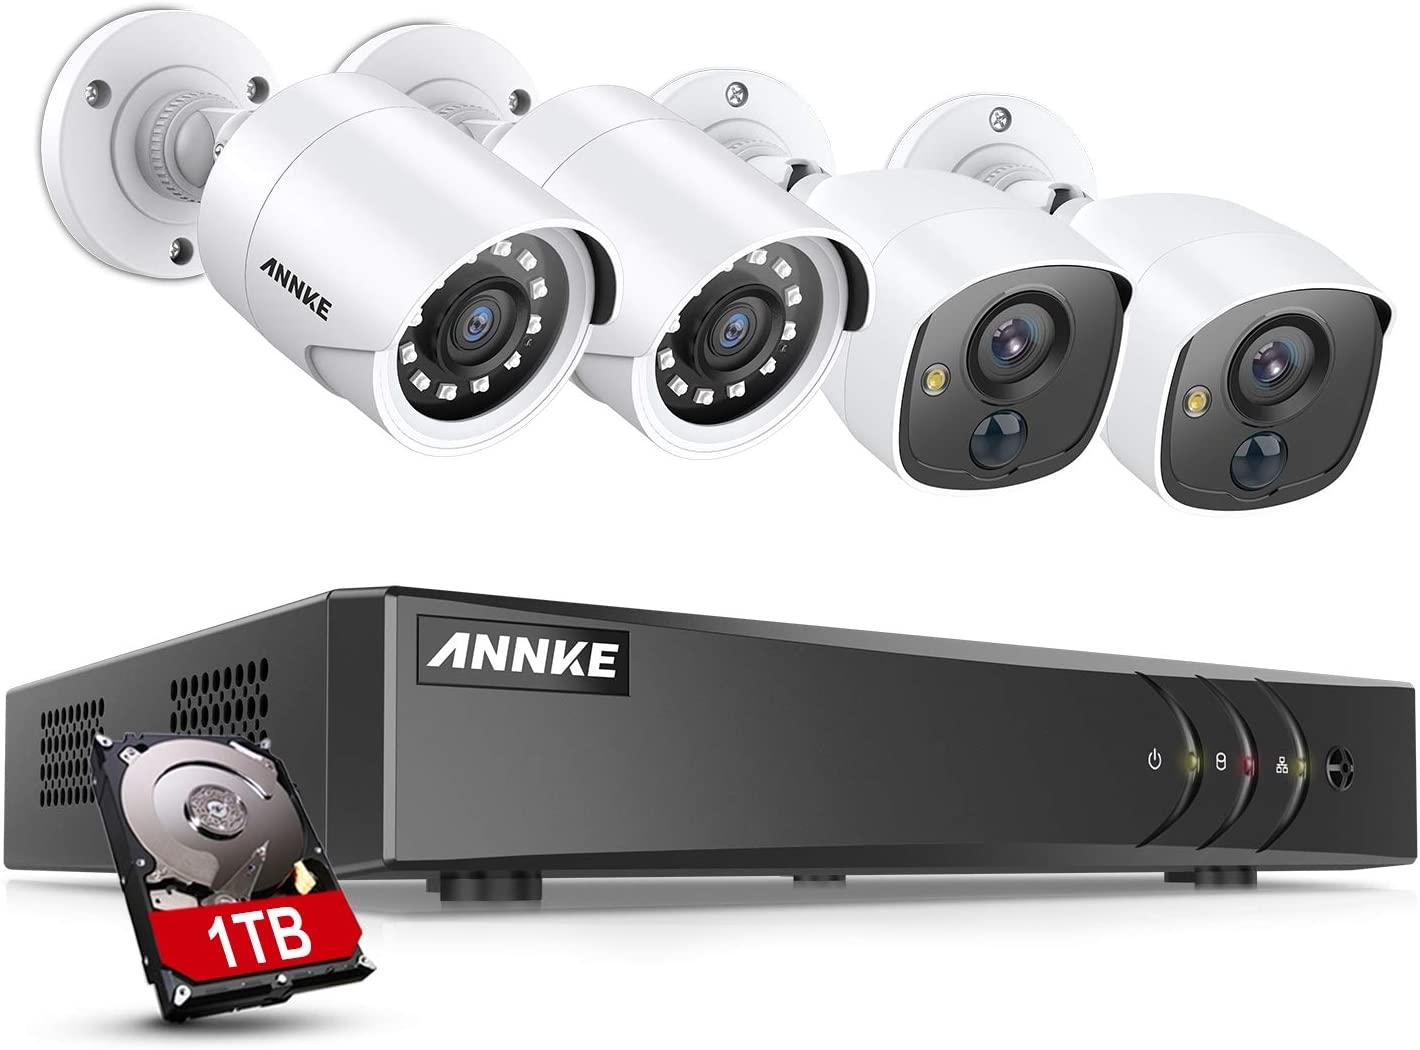 ANNKE 8CH 5MP Lite Surveillance 2 Camera Security System + 1TB Hard Drive $144.99 + FS